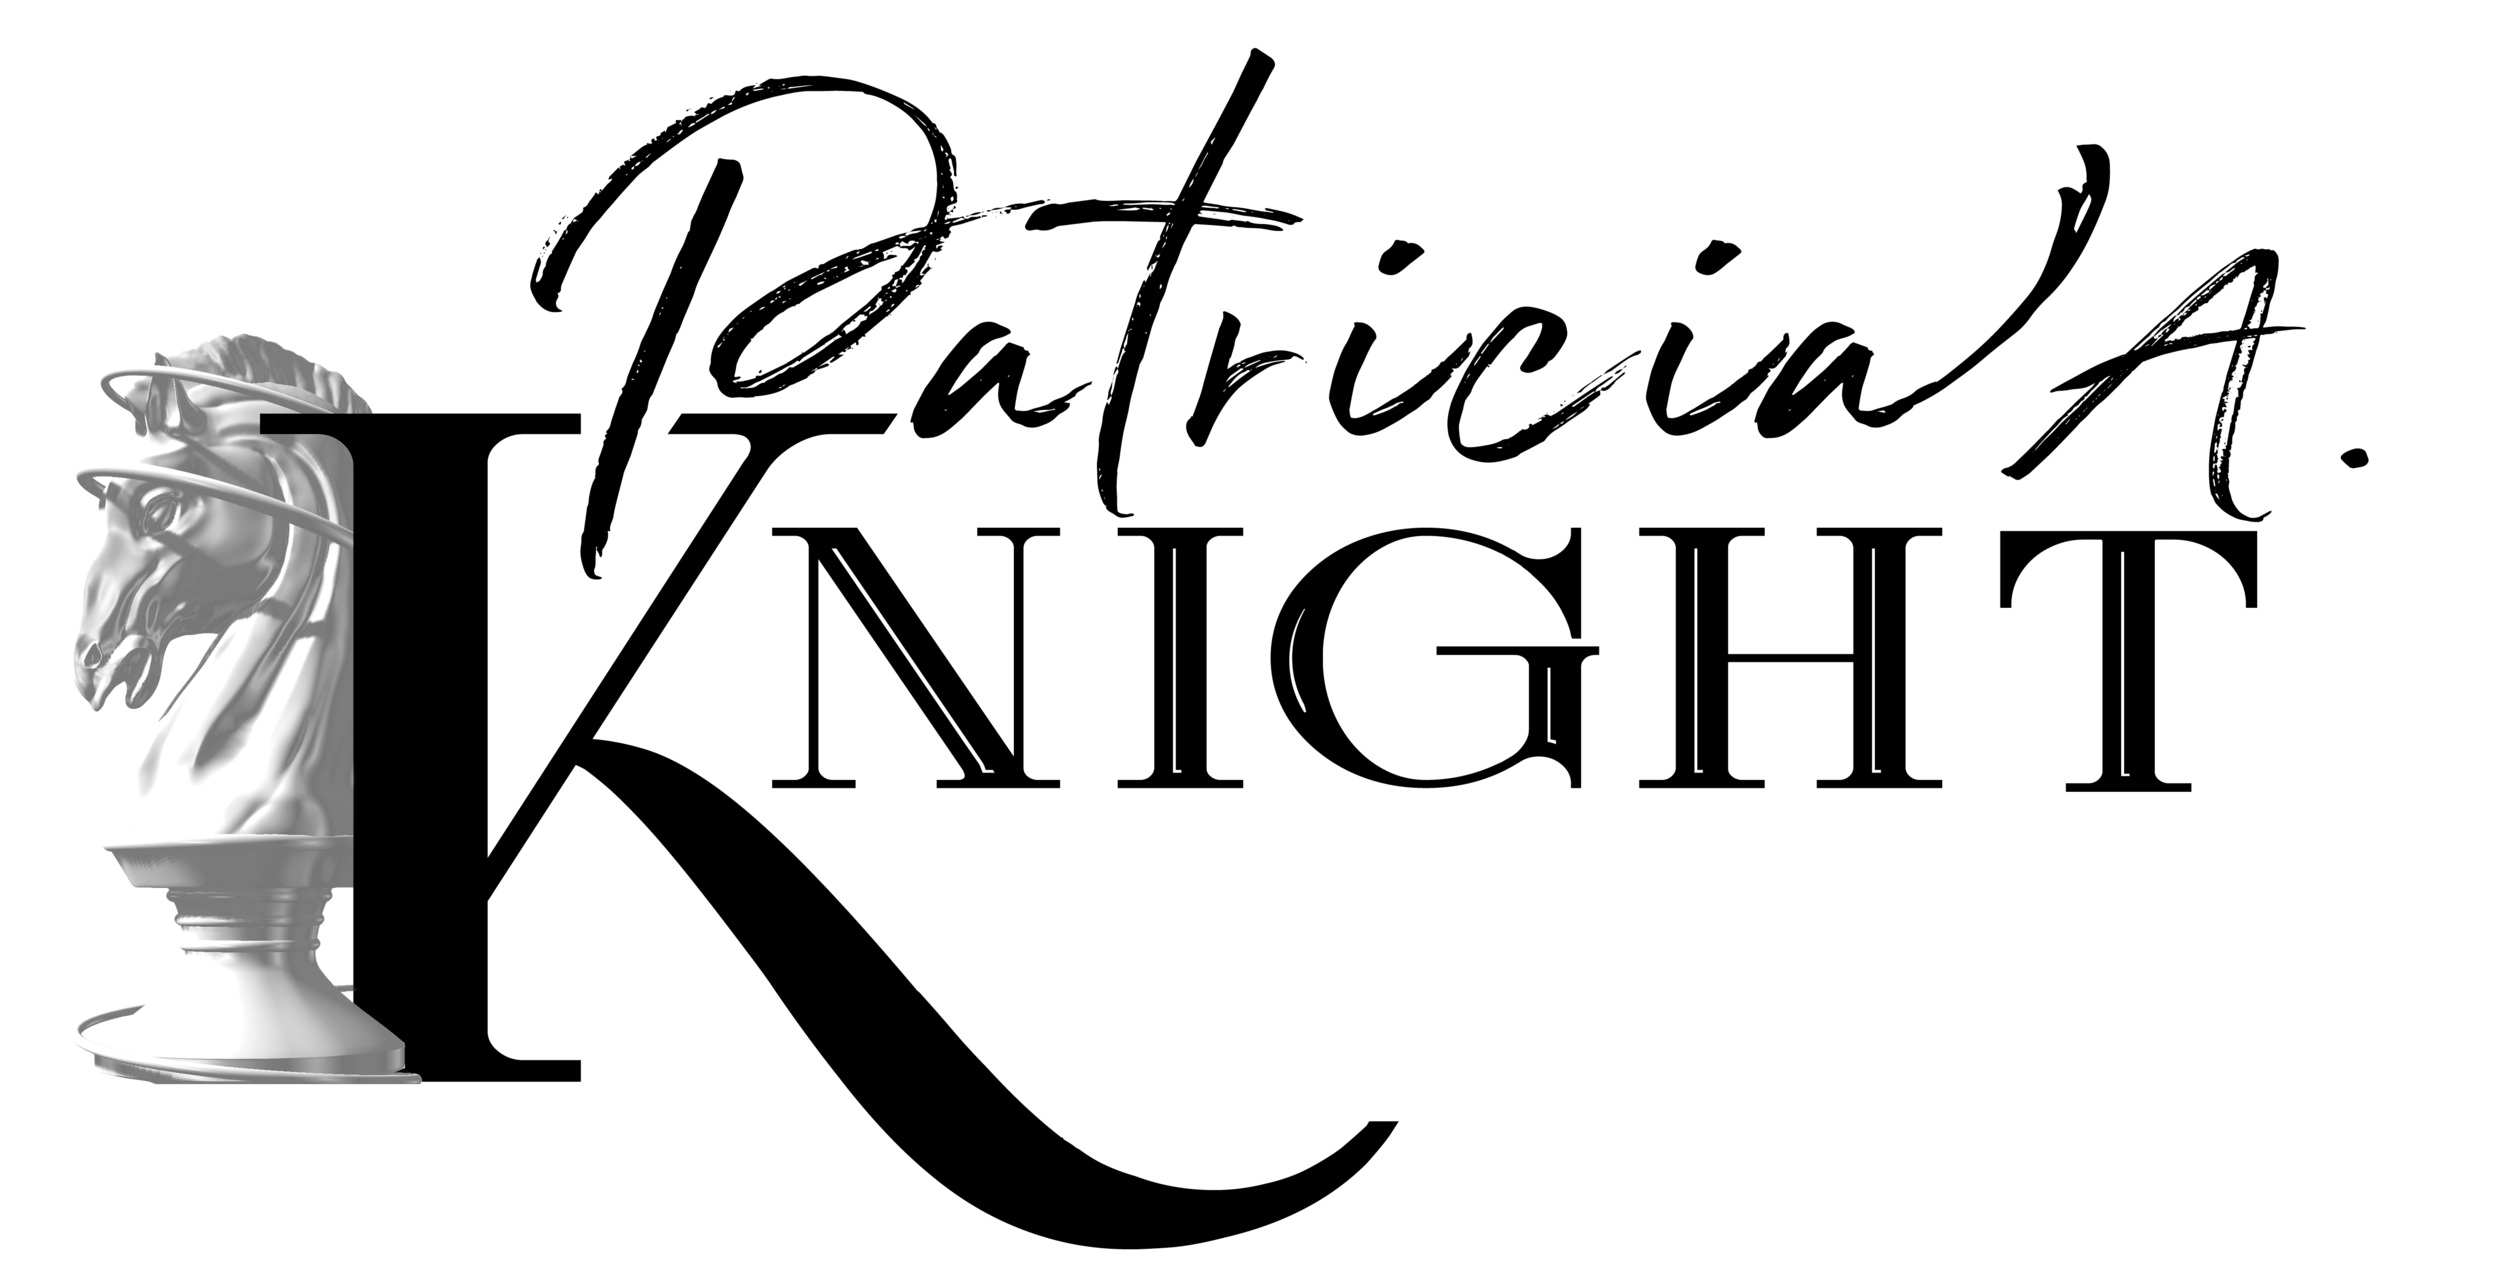 PKnight_LogoFINAL.jpg